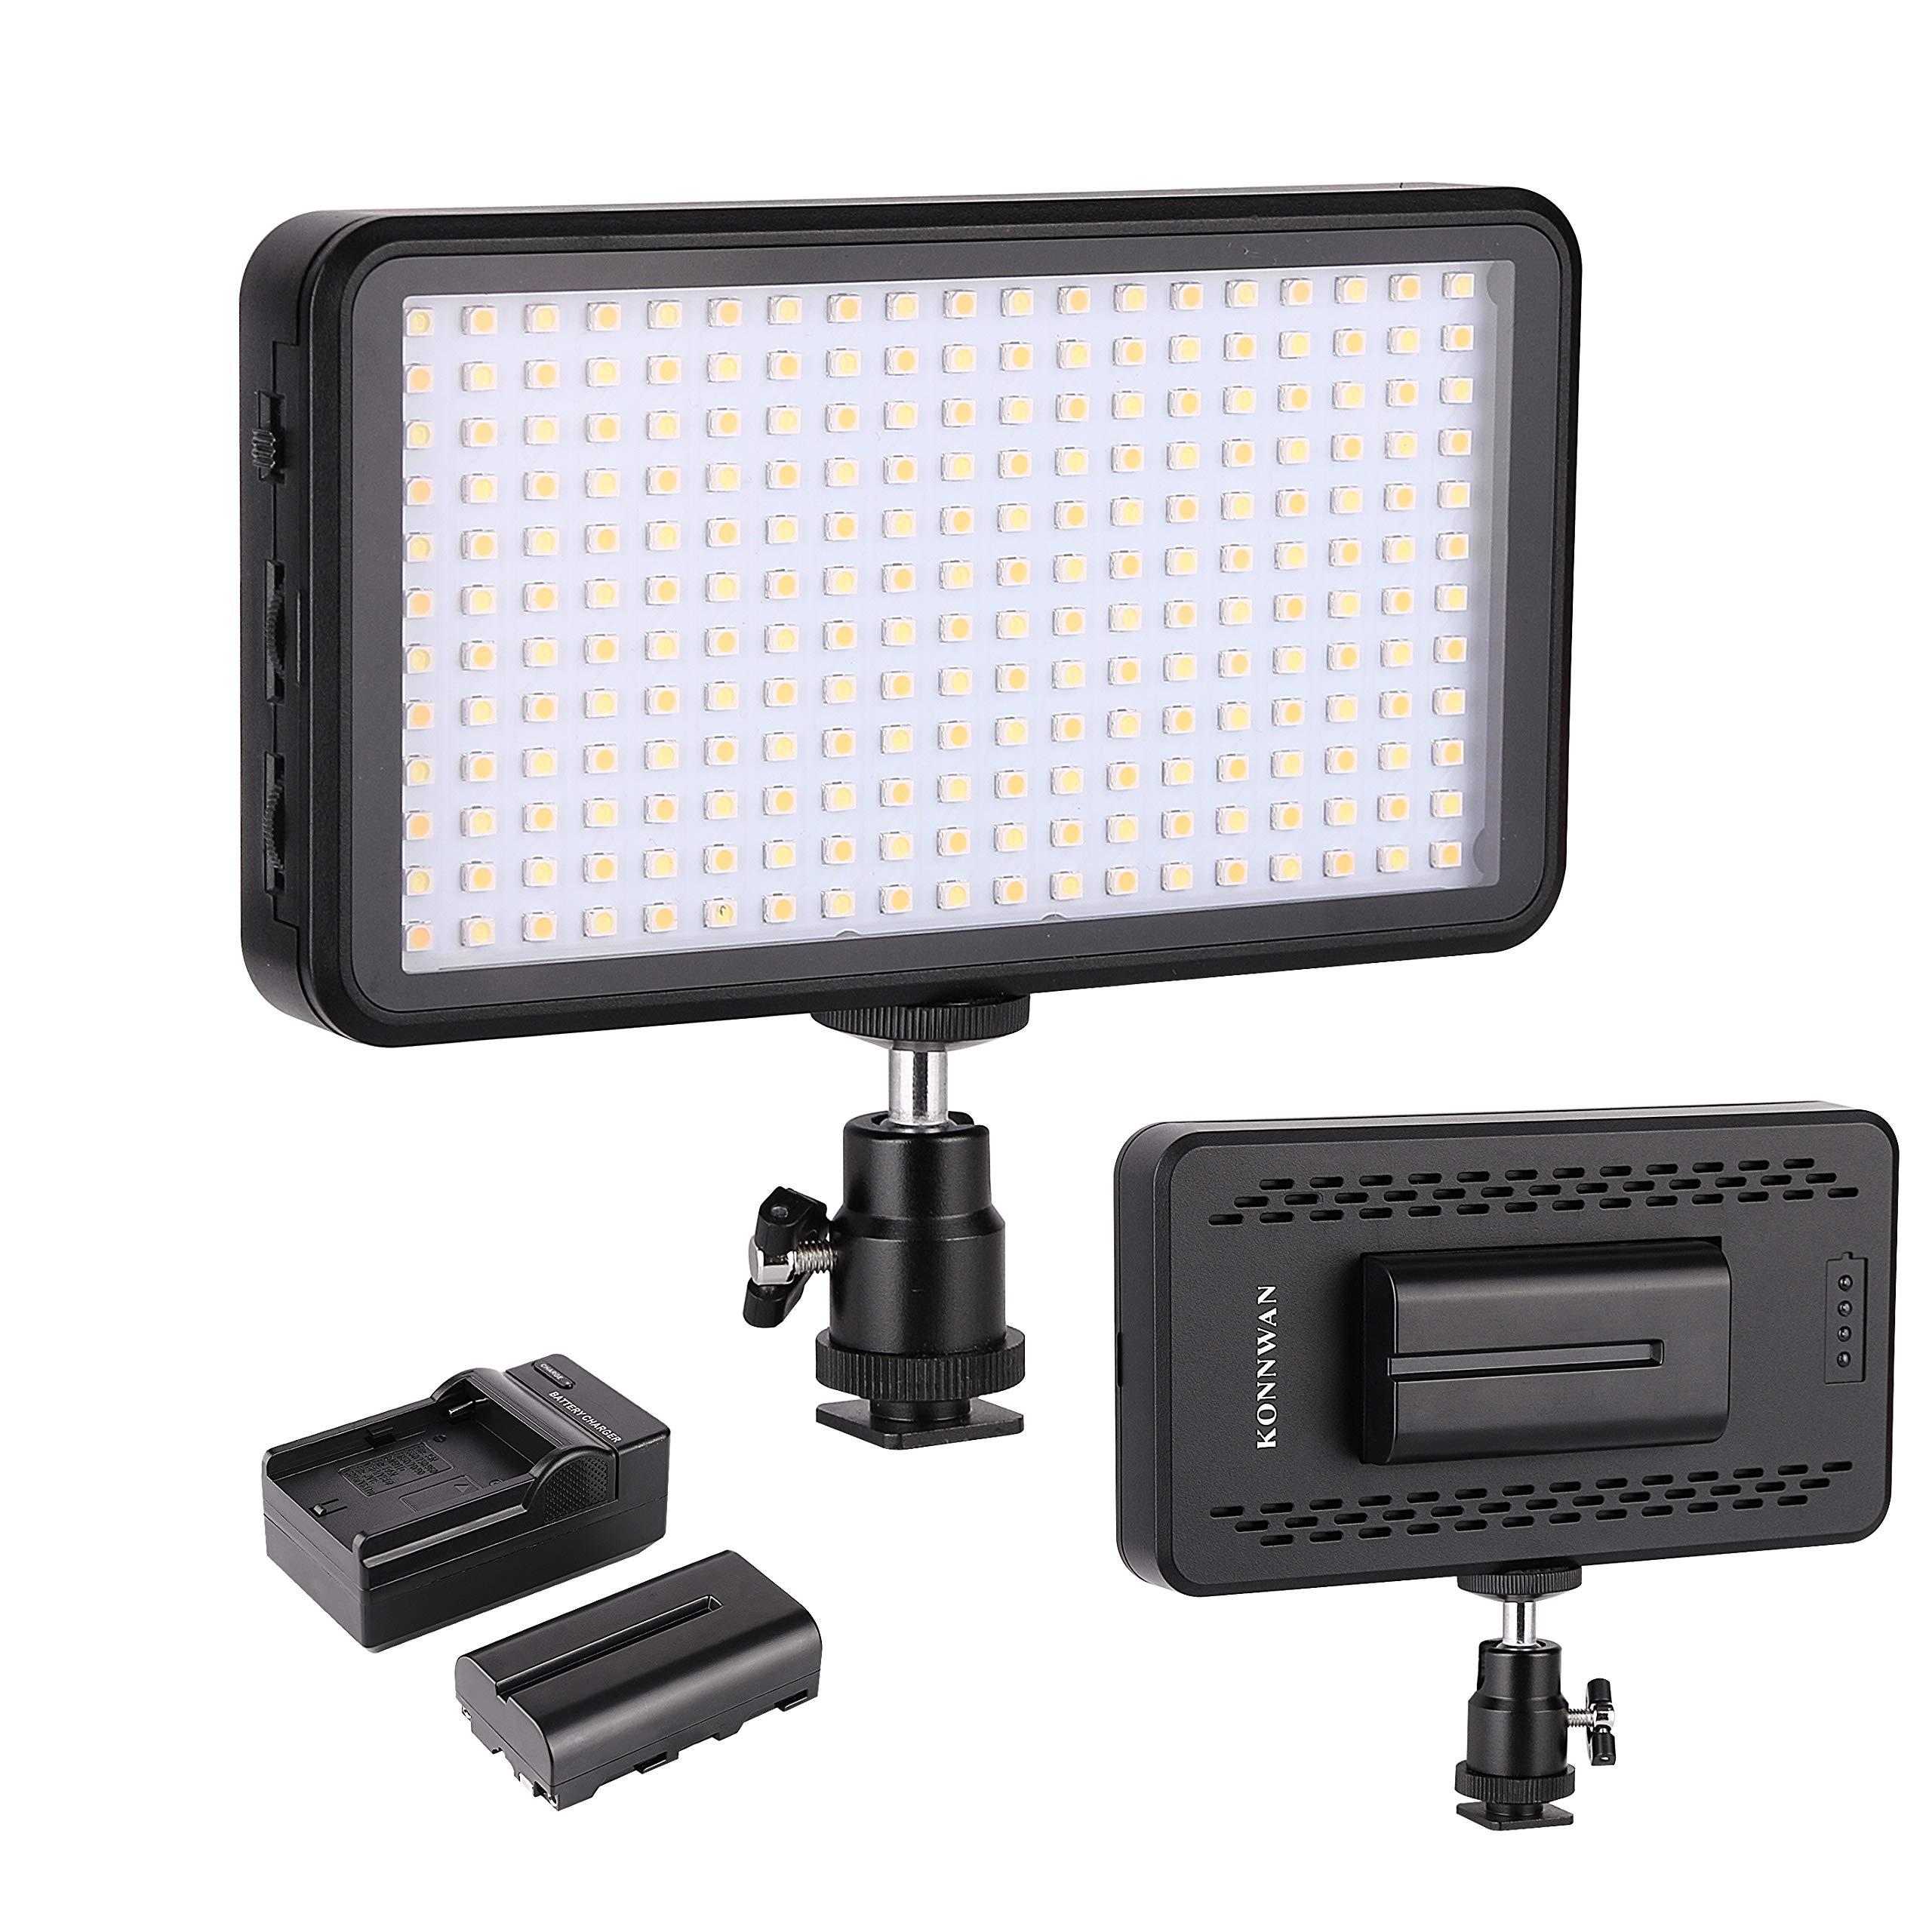 LED Video Light KONNWAN 228 for Digital DSLR Camera, Camcorder, High Brightness Lumen Value,6000k Dimmable Switch with Color Filter Gel, led Vedio Lighting kit Included led Battery Charger stents by KONNWAN